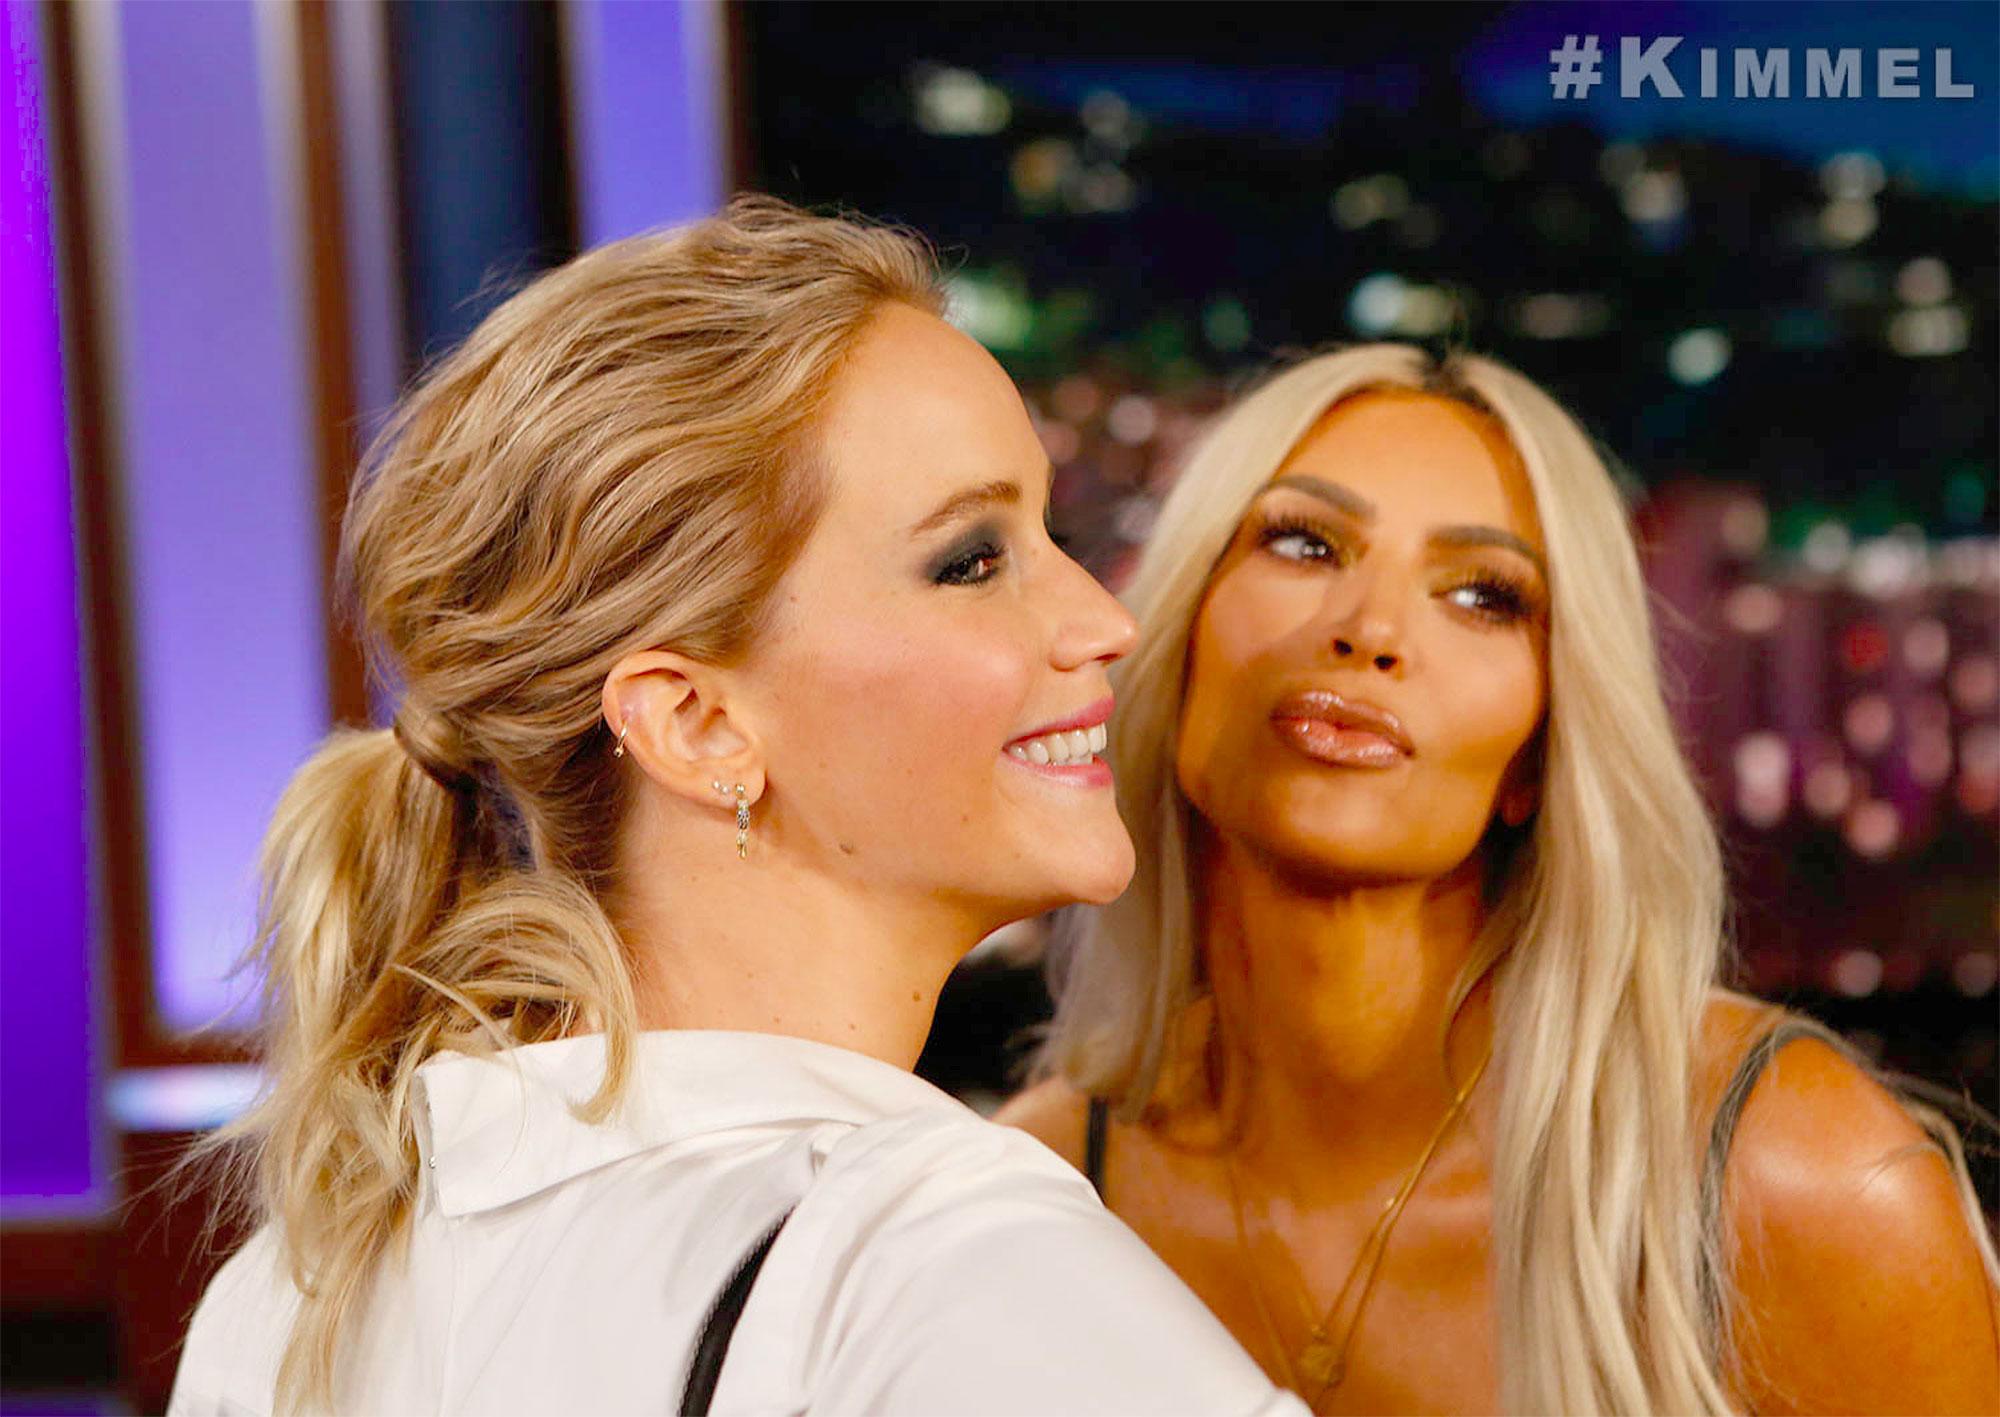 jennifer-lawrence-kim-kardashian-3.jpg